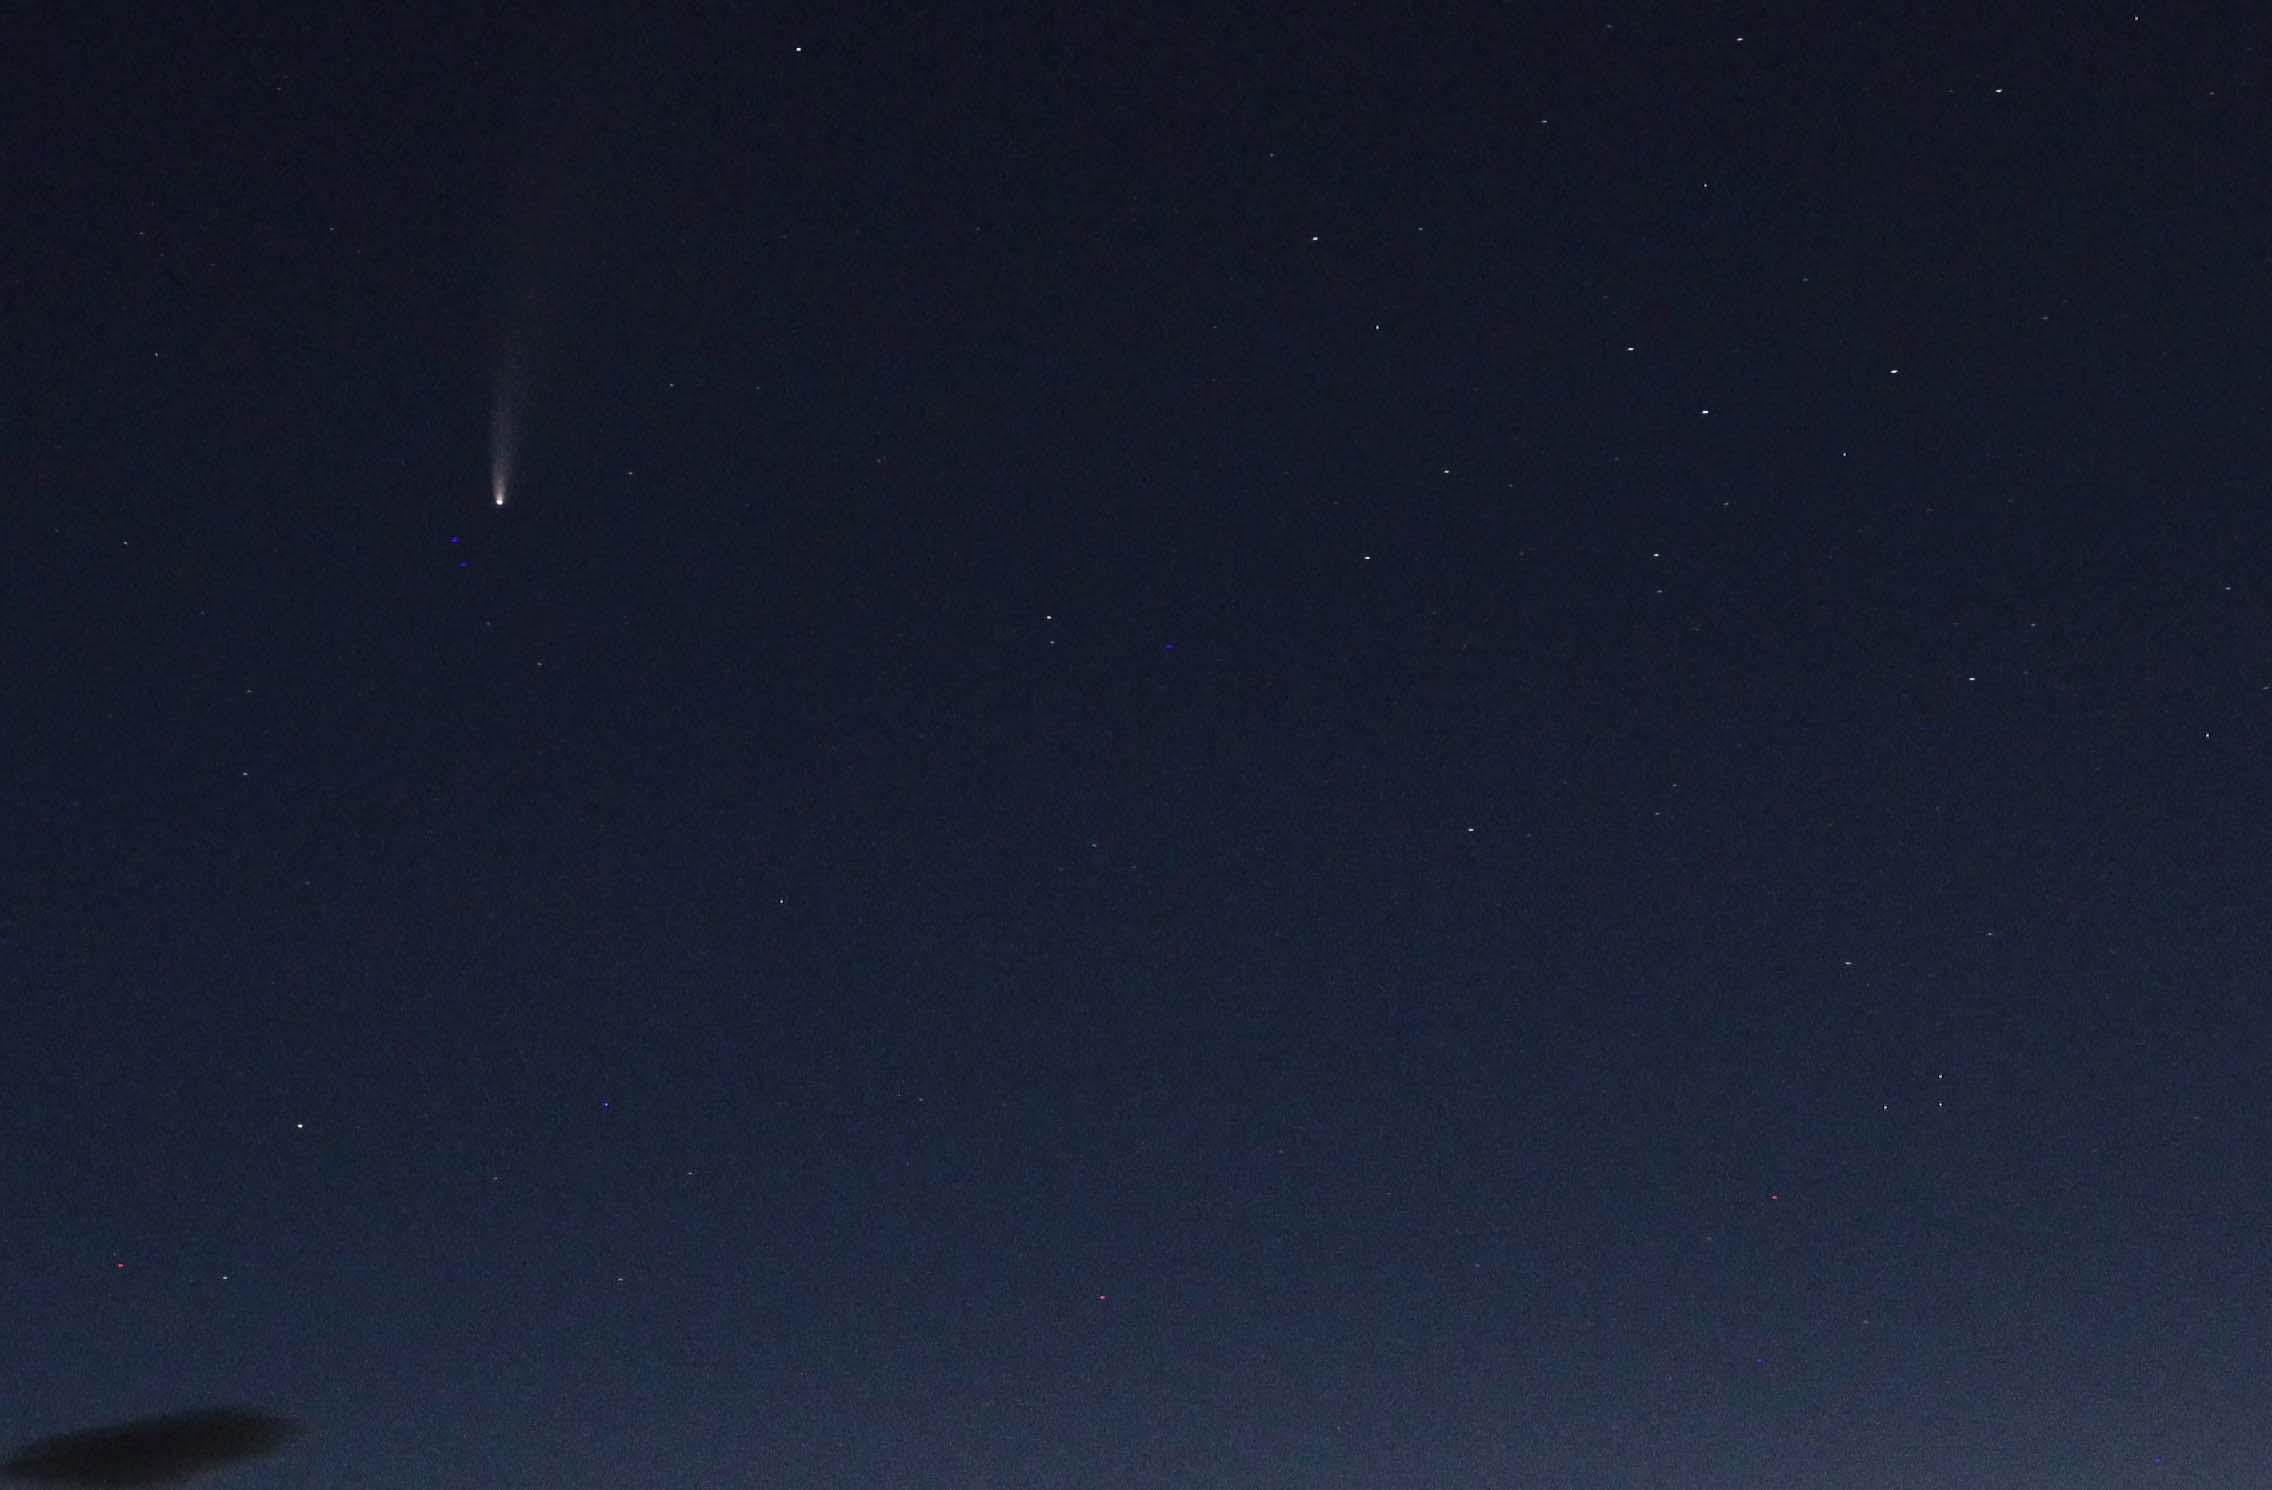 Neowise comet against a dark sky